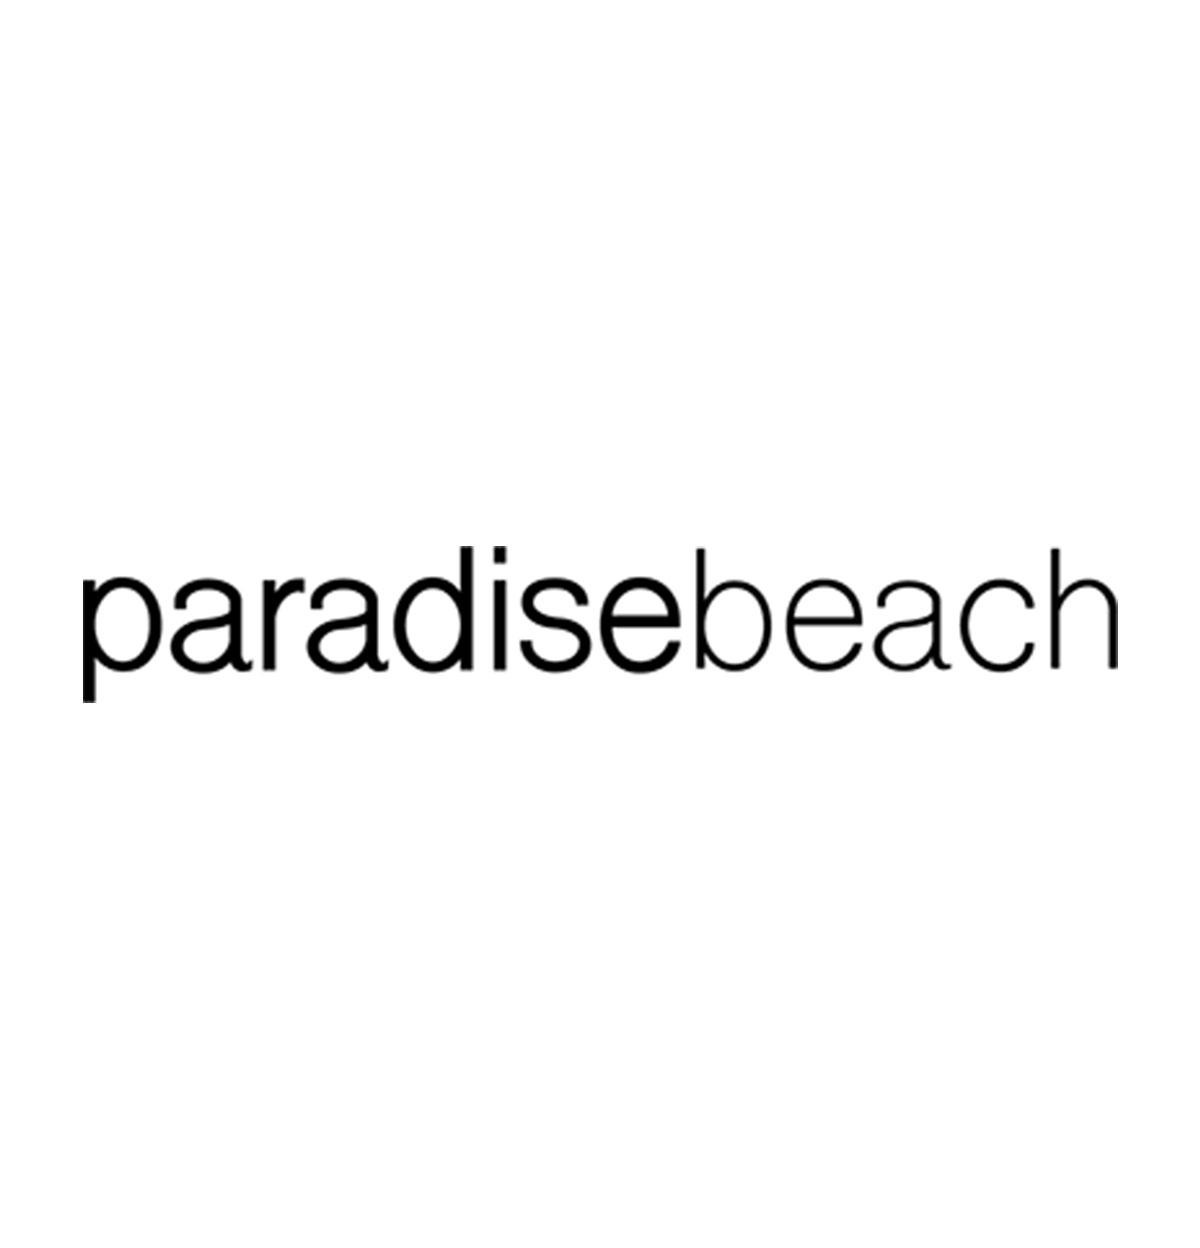 logo paradise beach